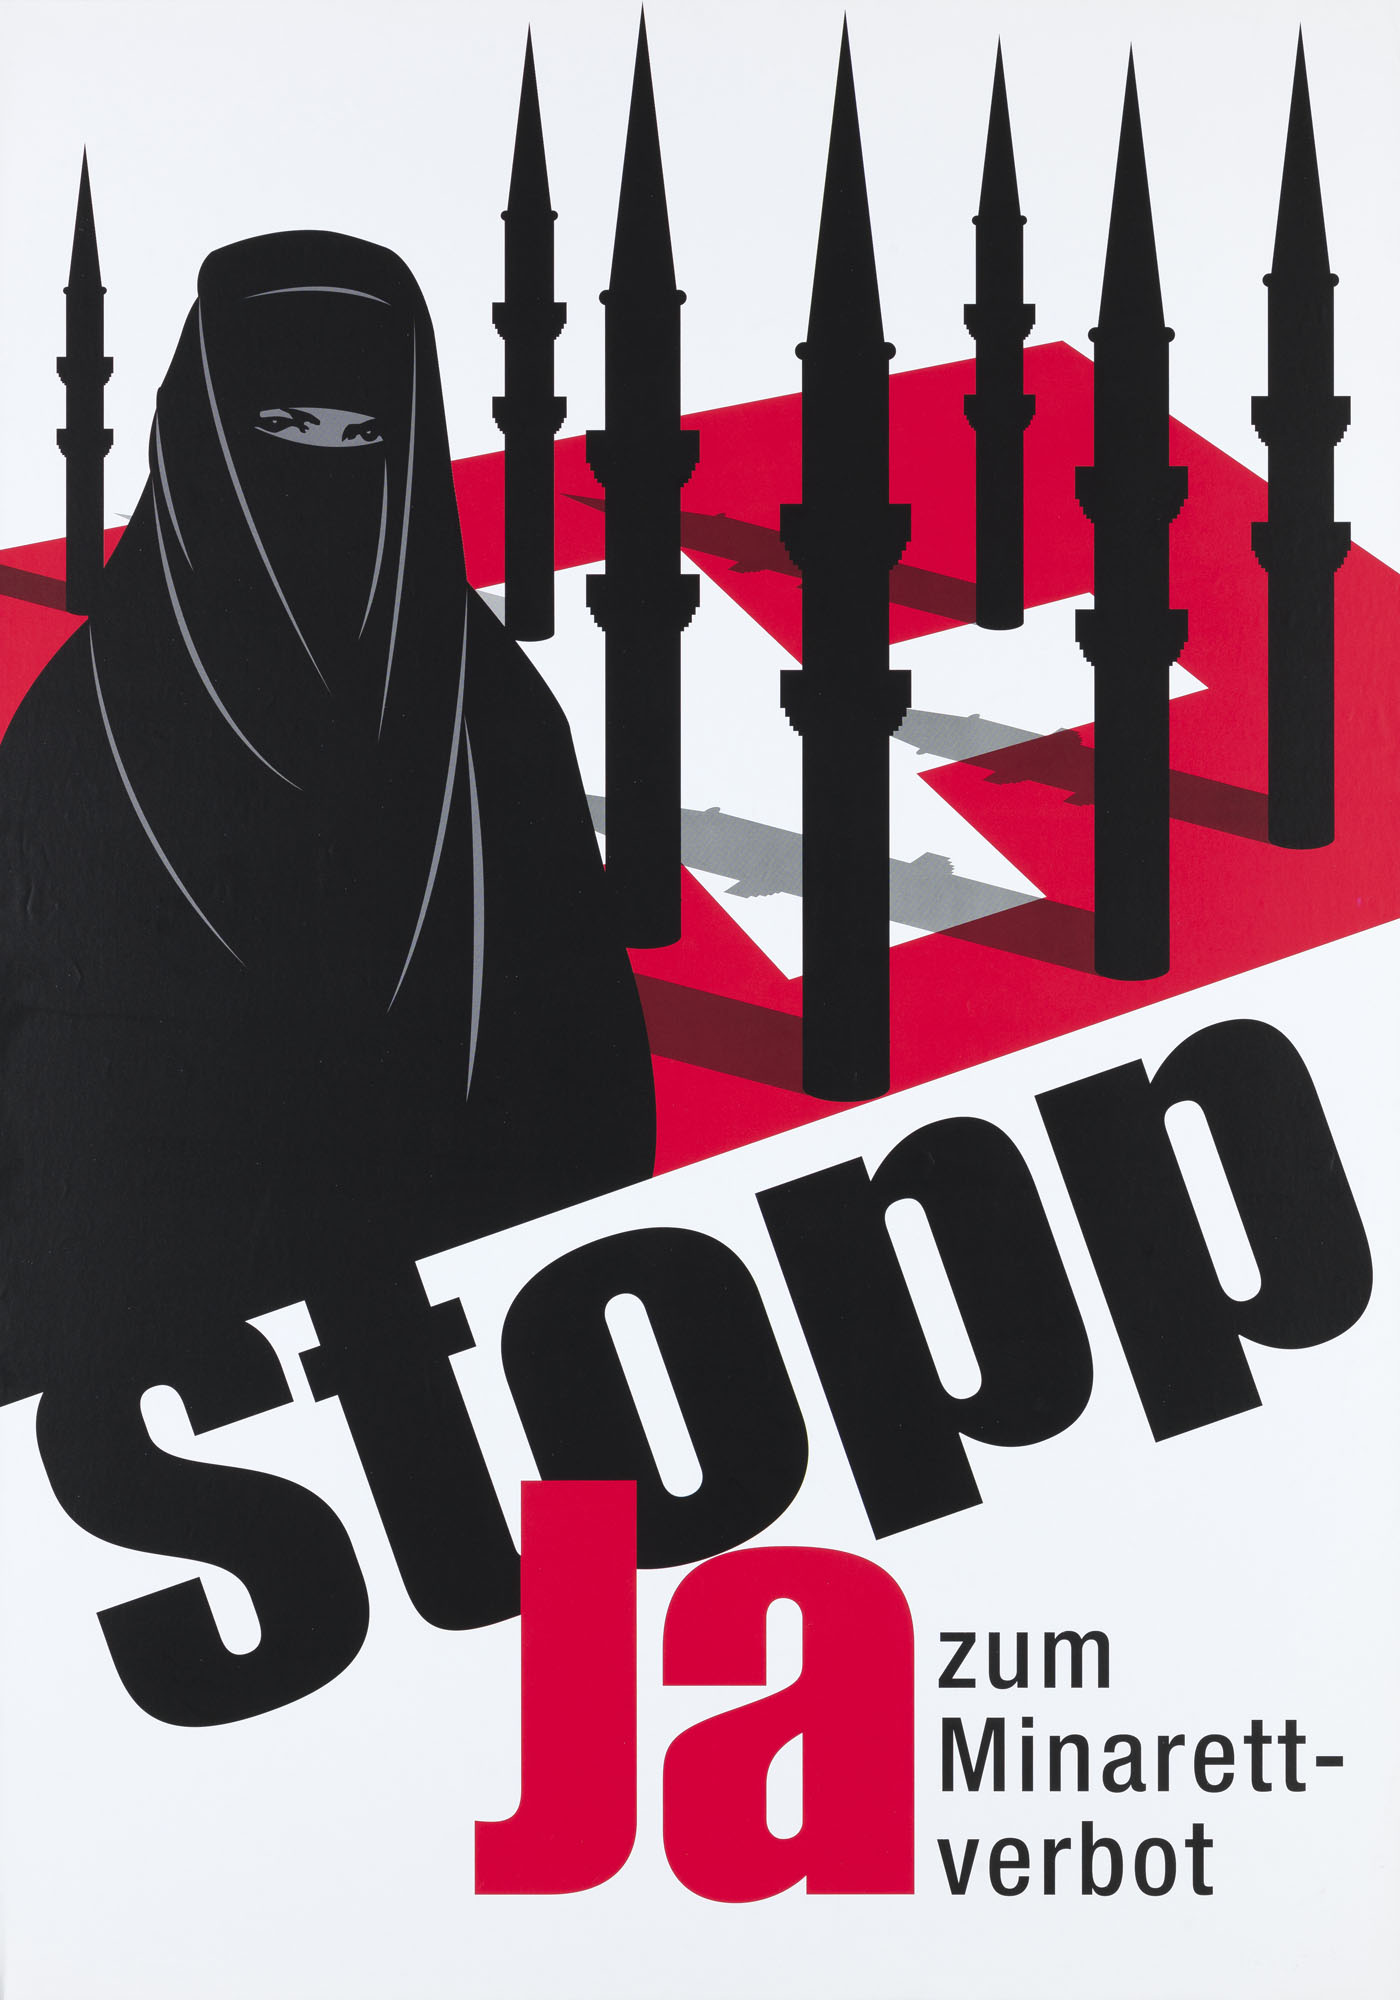 Stopp – Ja zum Verbot von Kriegsmaterial-Exporten Christof Nüssli Severin Egli Poster